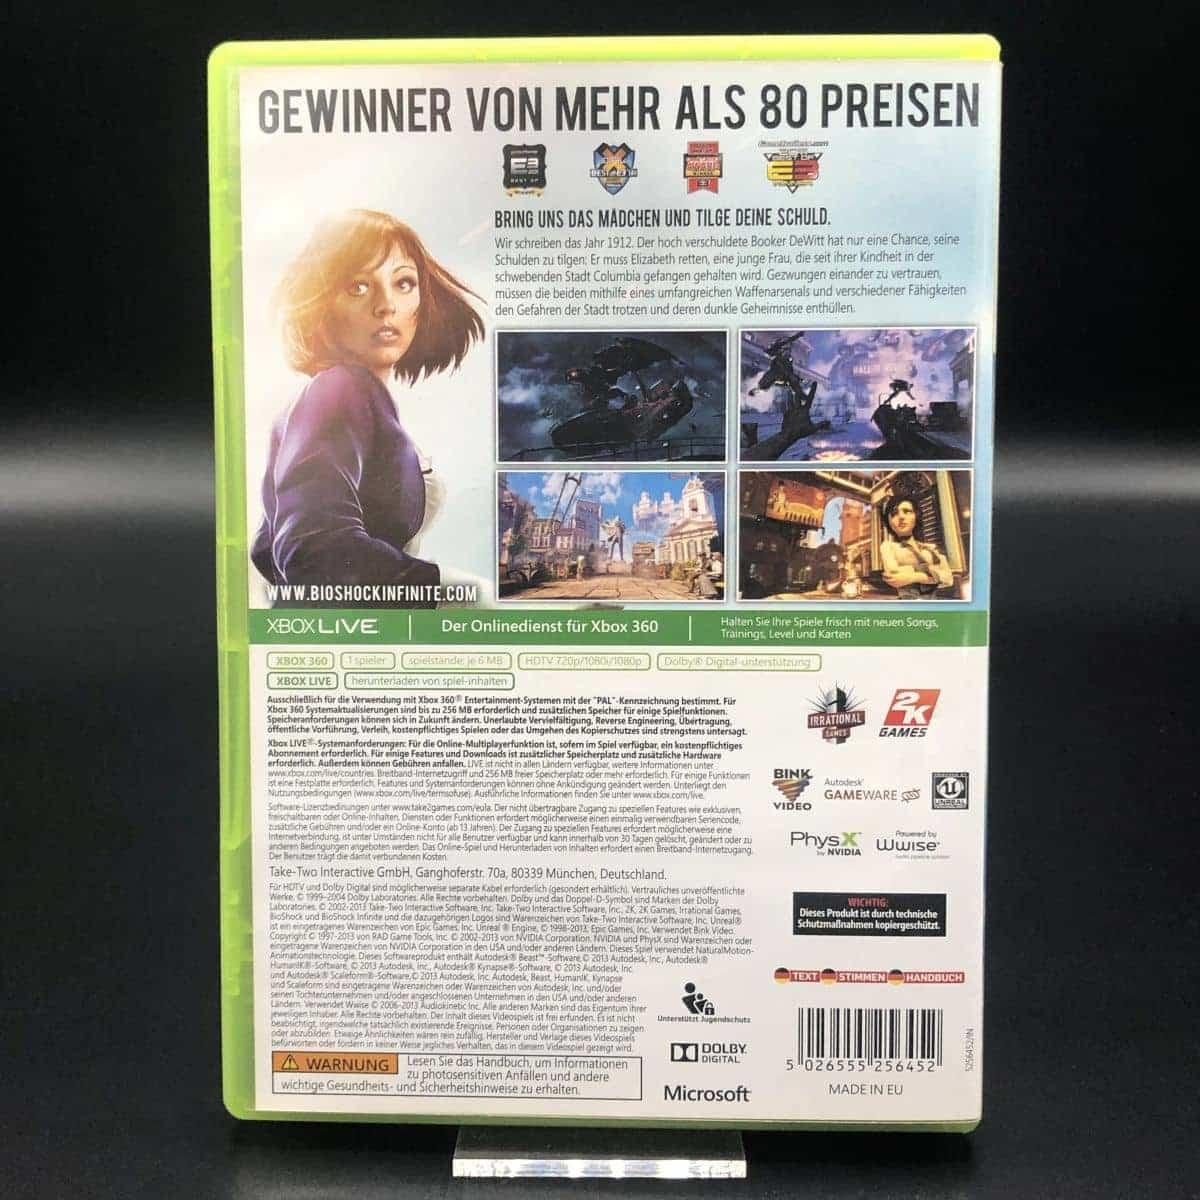 BioShock Infinite (Komplett) (Sehr gut) XBOX 360 (FSK18)